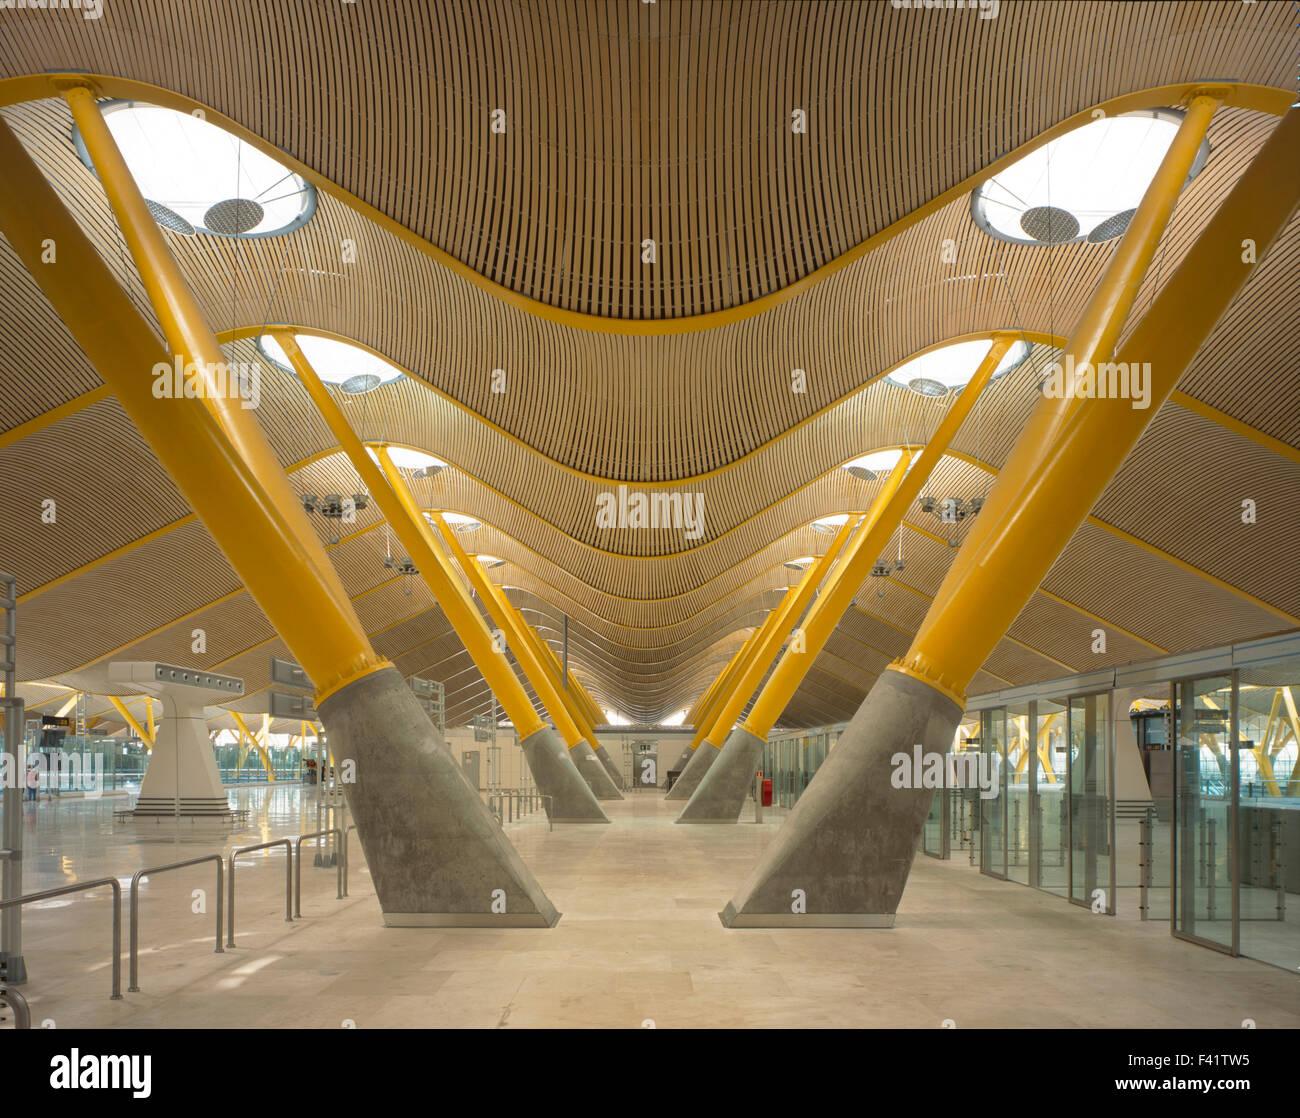 Barajas Airport. Madrid, Spain | Richard Rogers